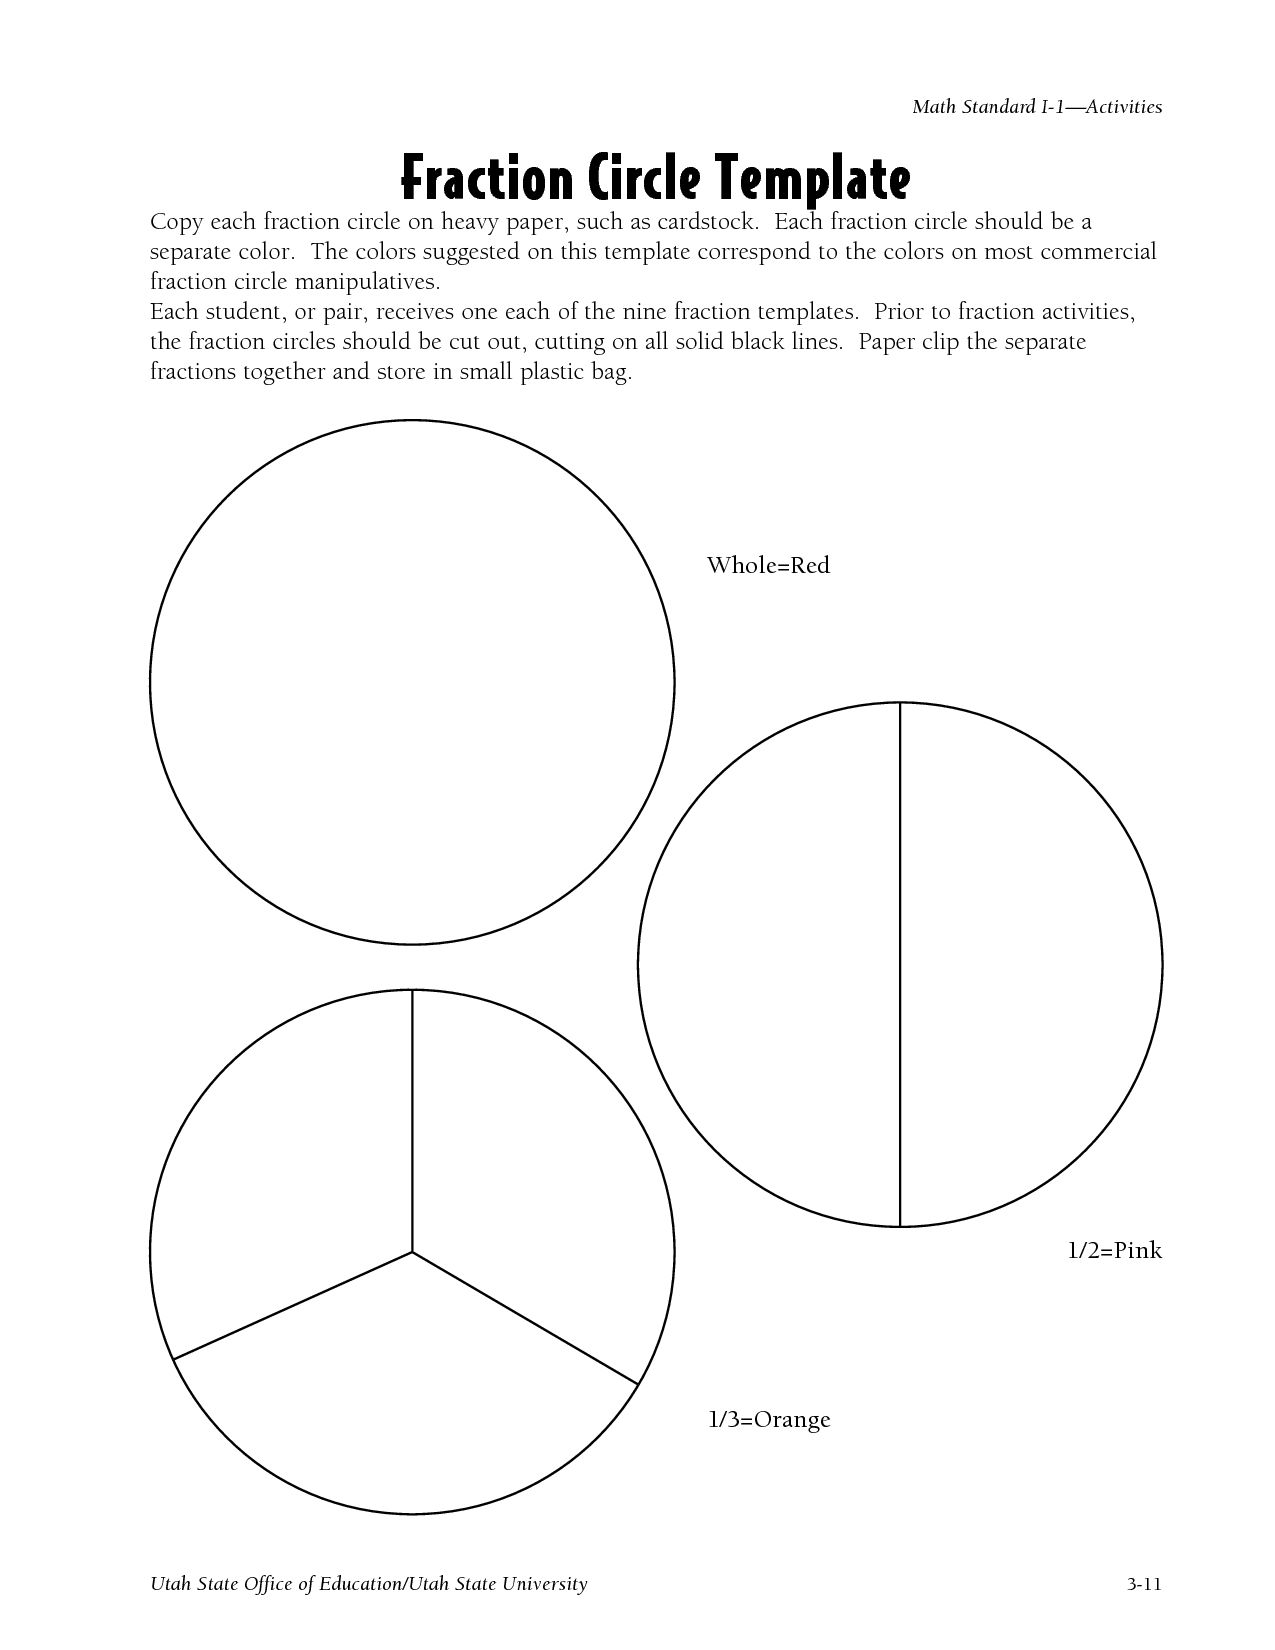 Blank Fraction Circles